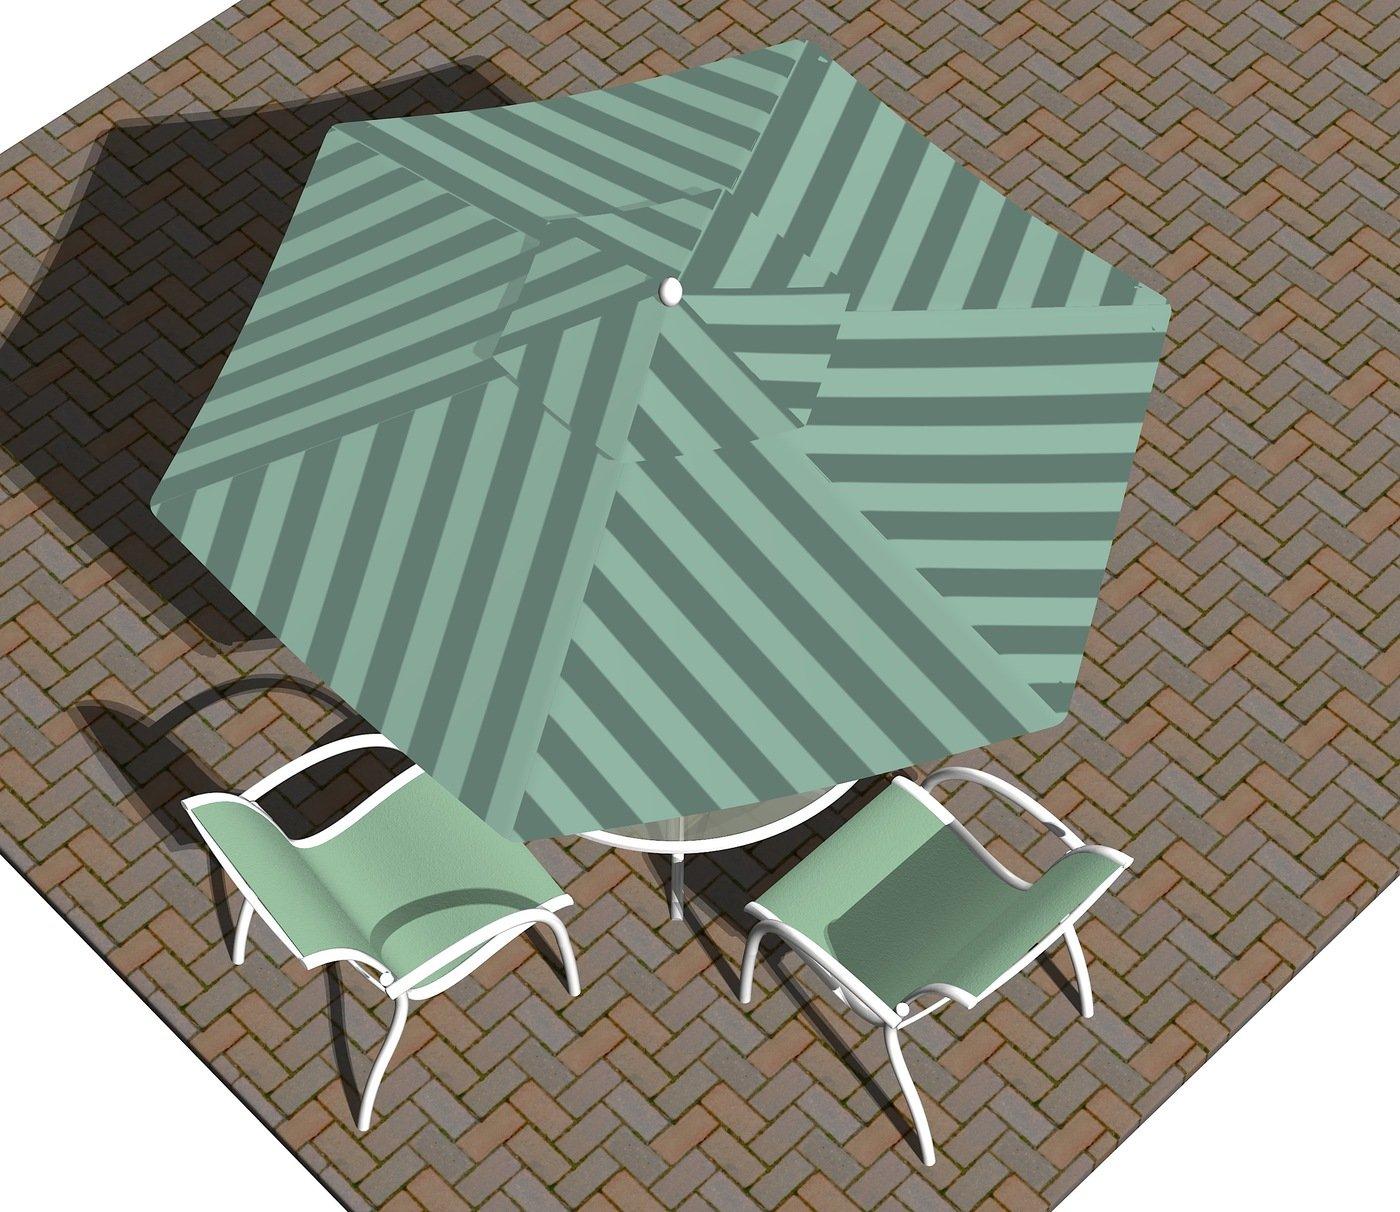 Furniture Design By Michael Burridge At Coroflot Com